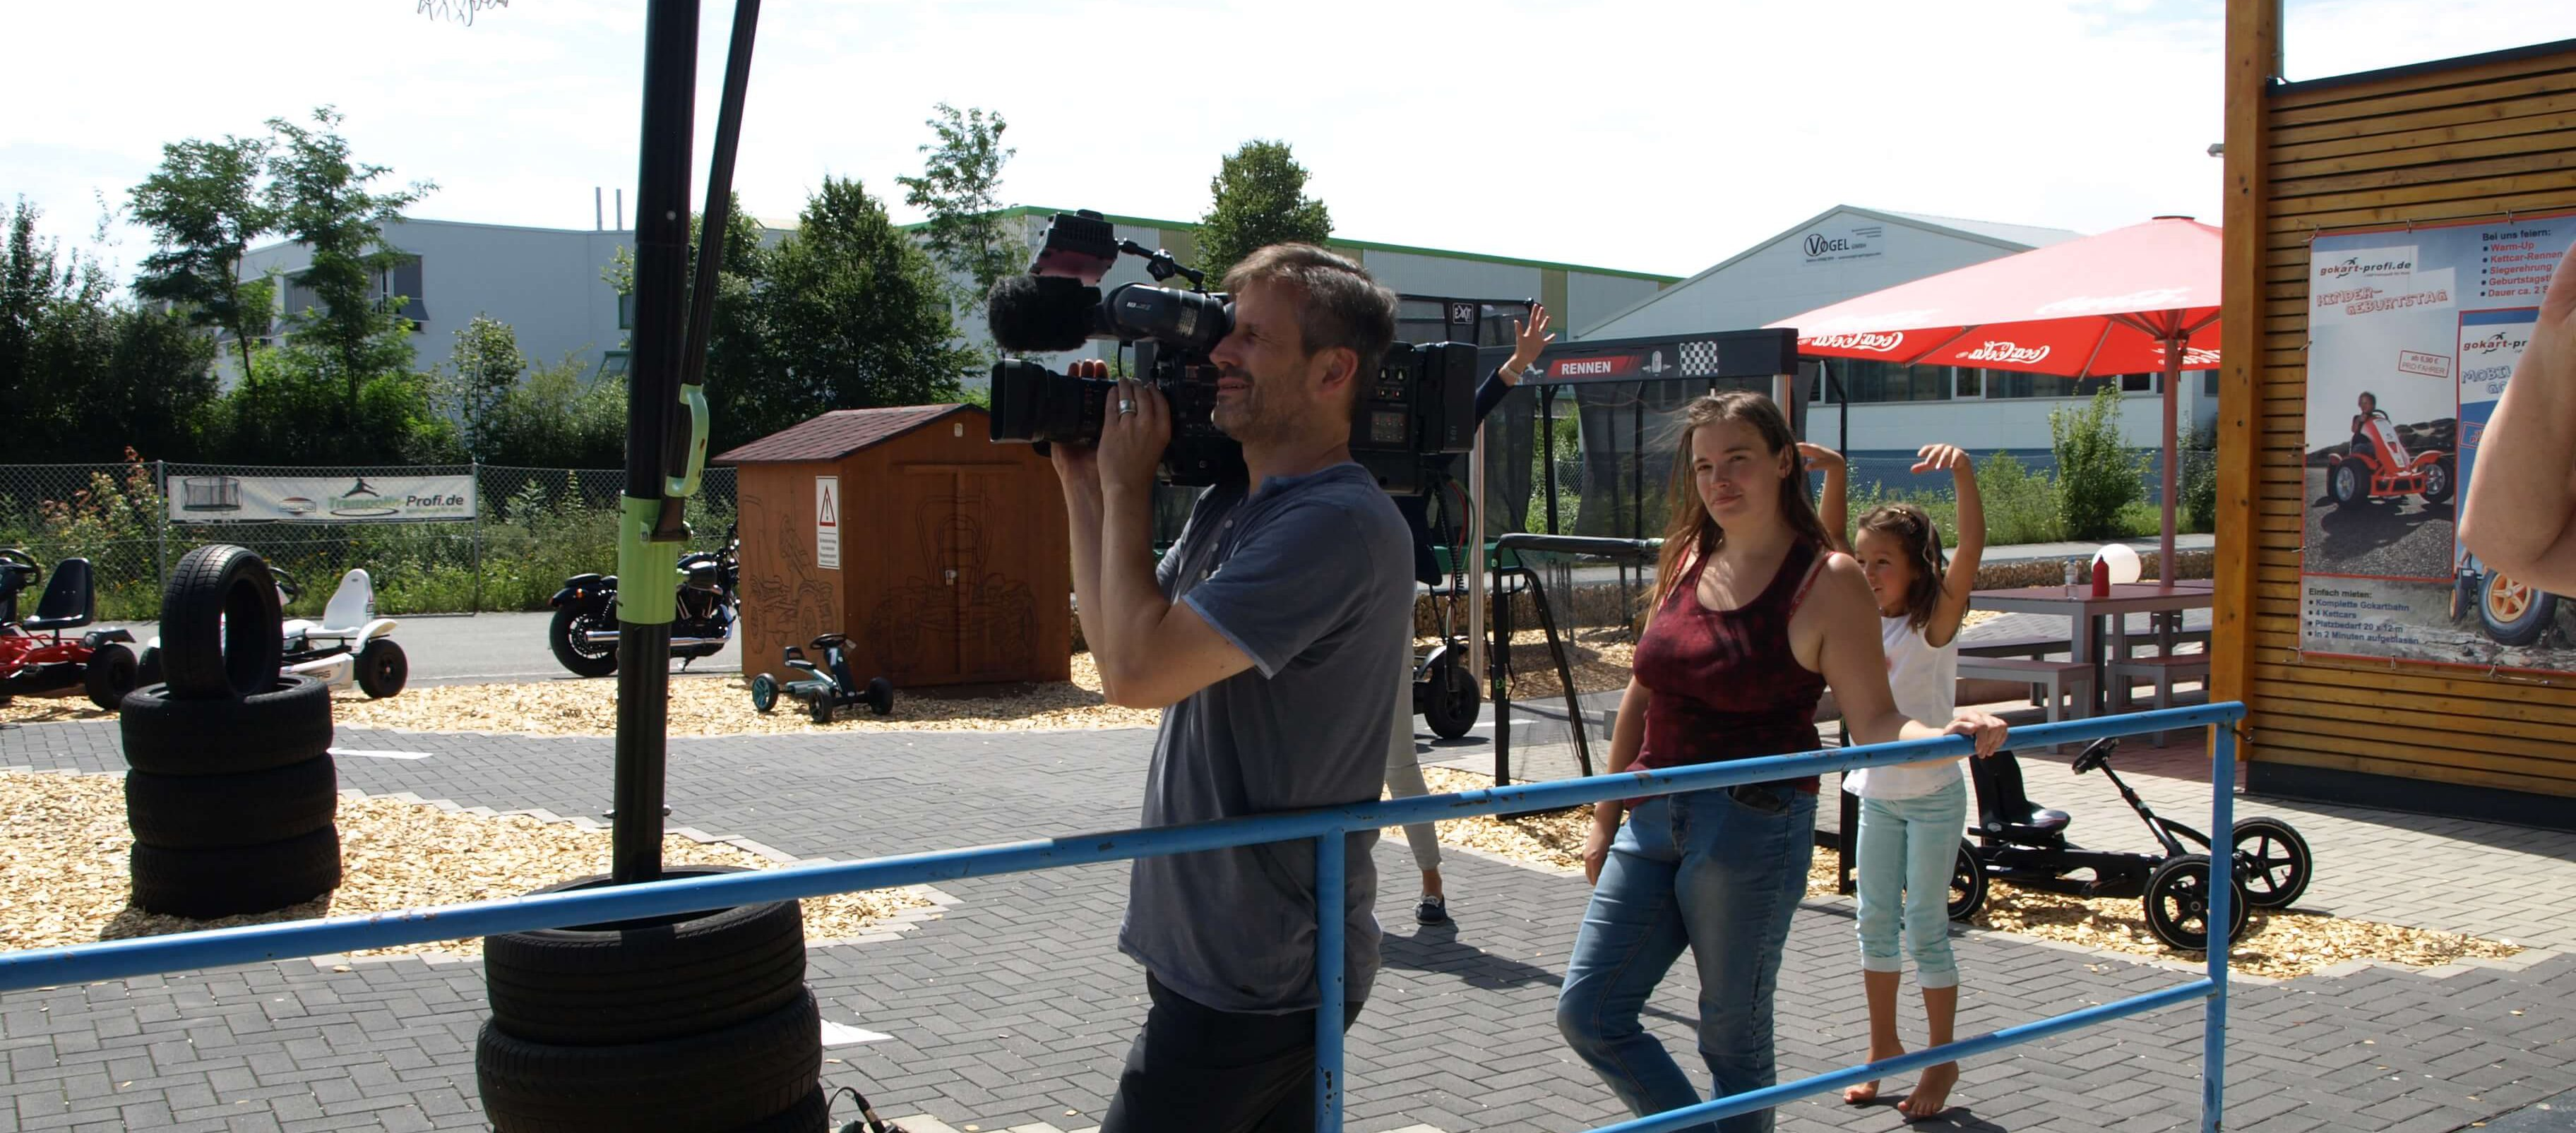 ZDF Morgenmagazin Volle Kanne beim Drehtag bei Gokart-Profi - Trampolin-Profi Nürnberg